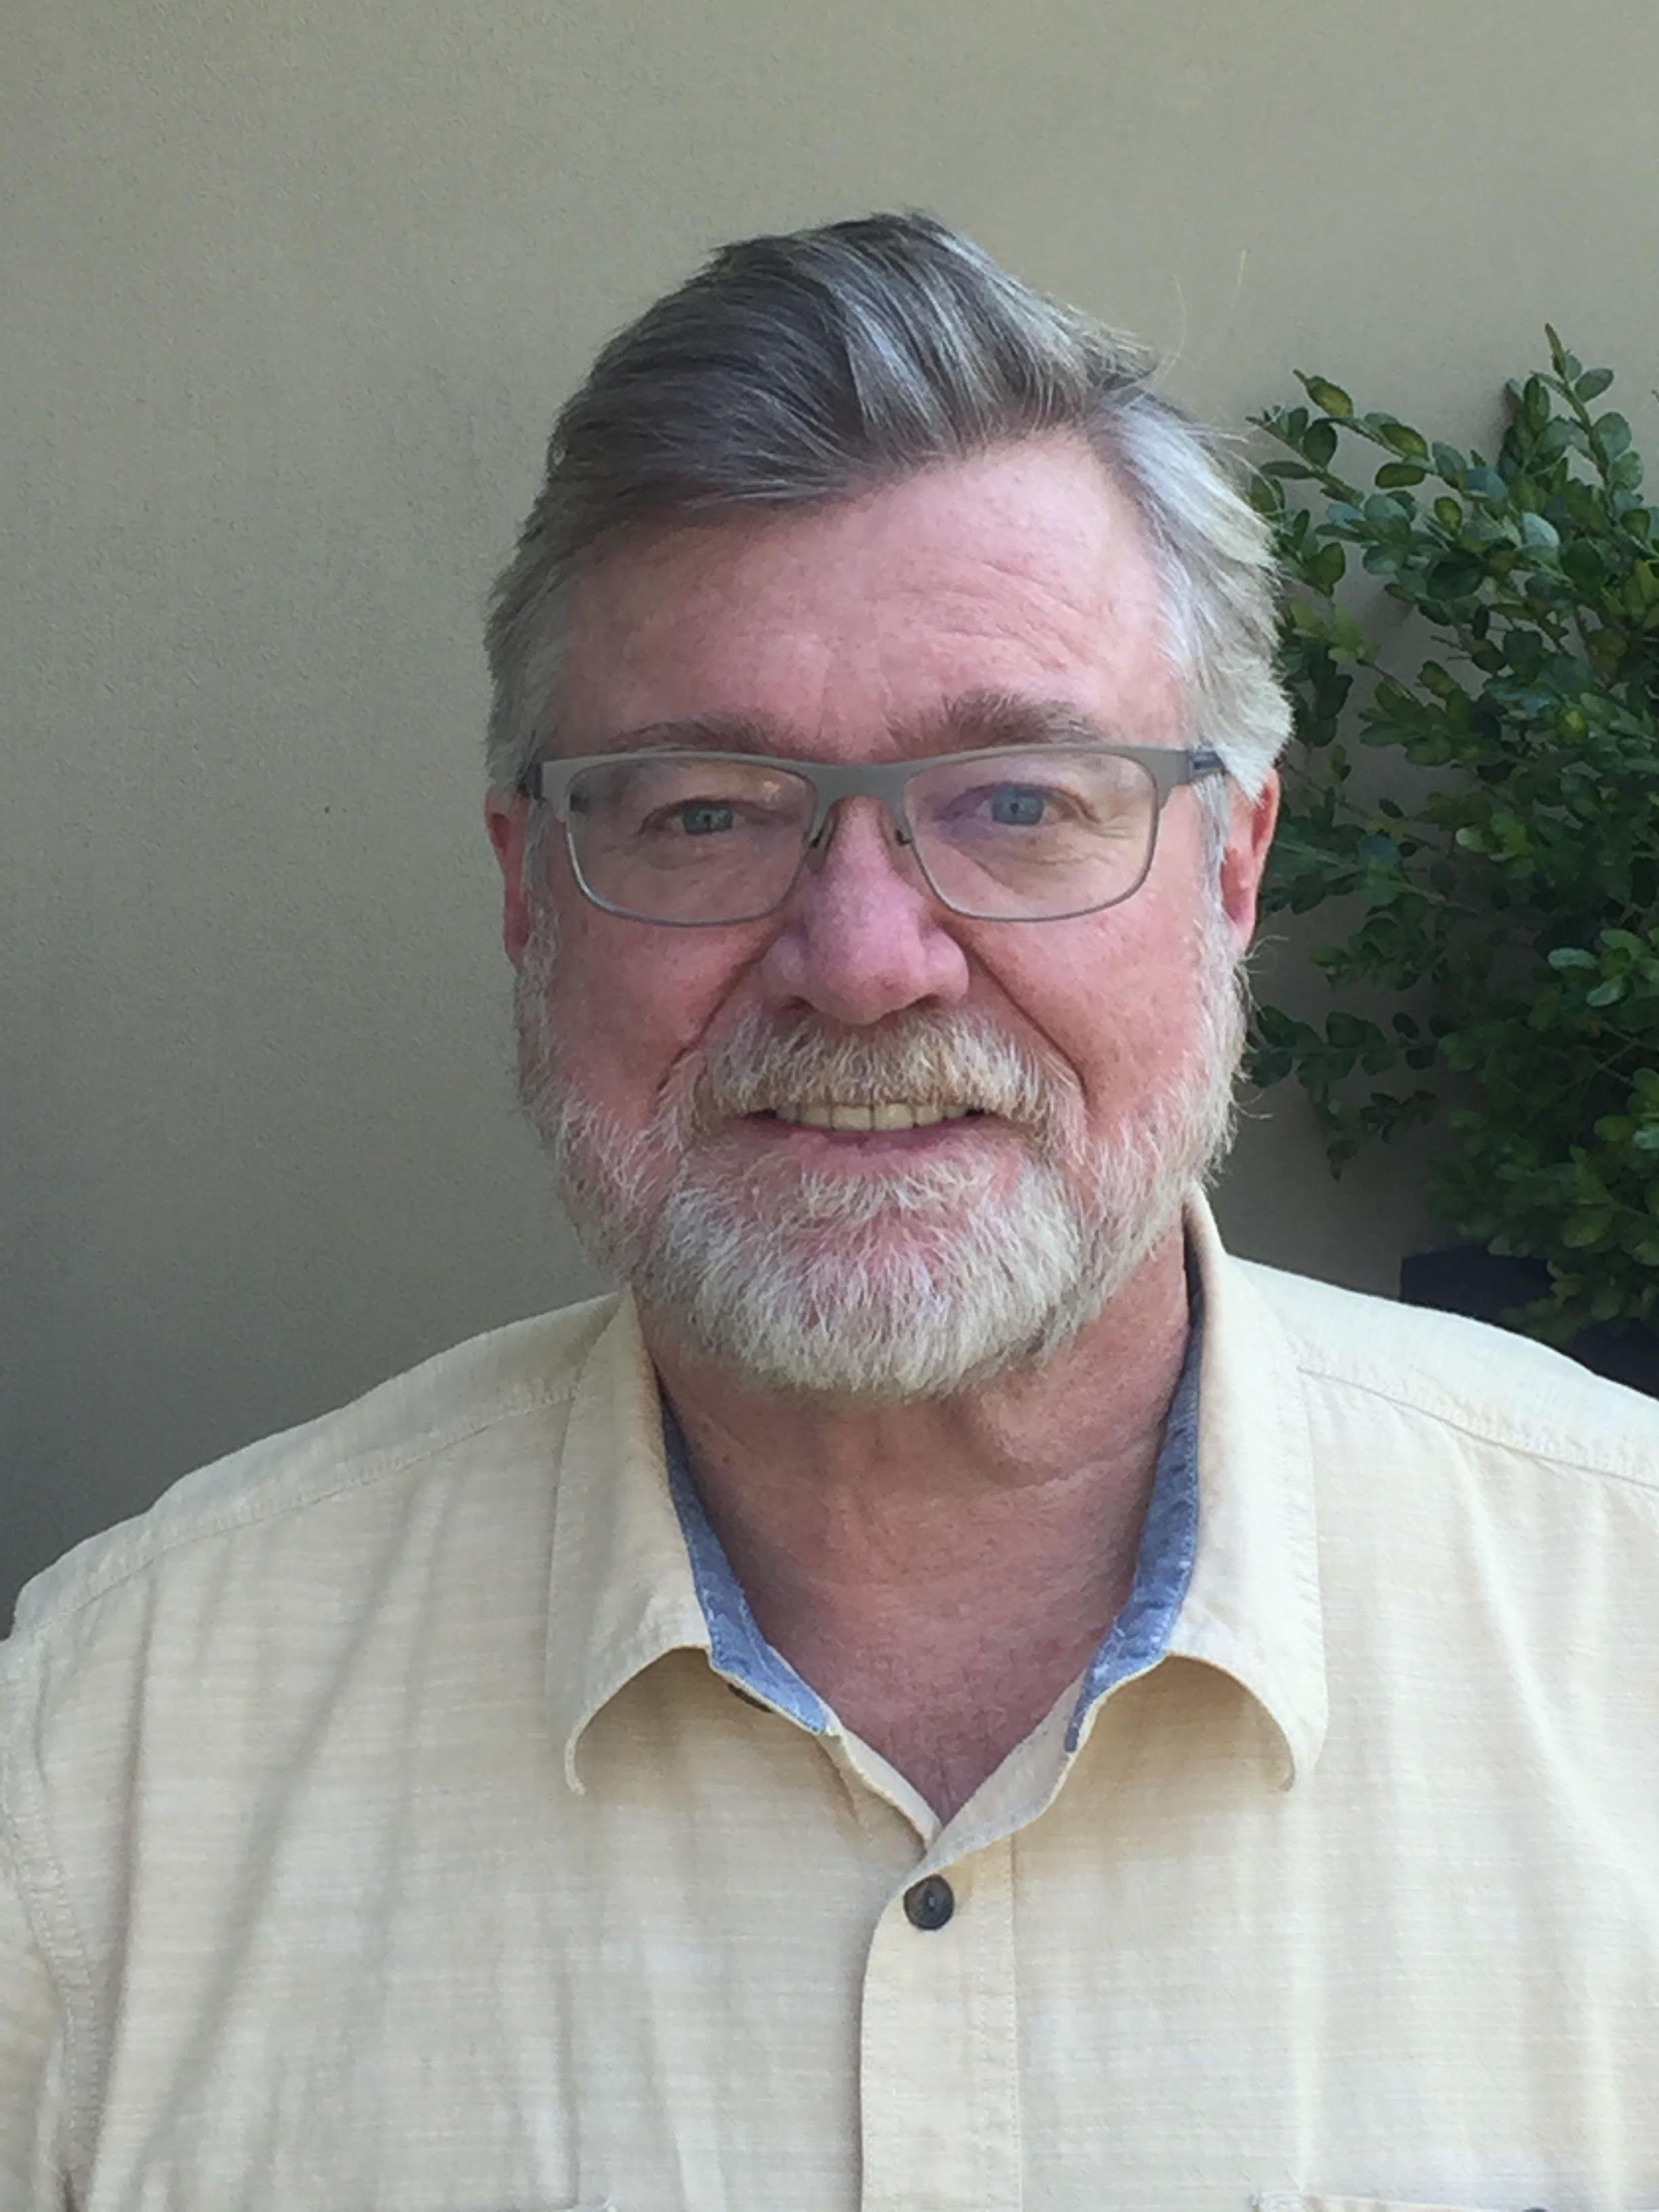 Christopher Smart